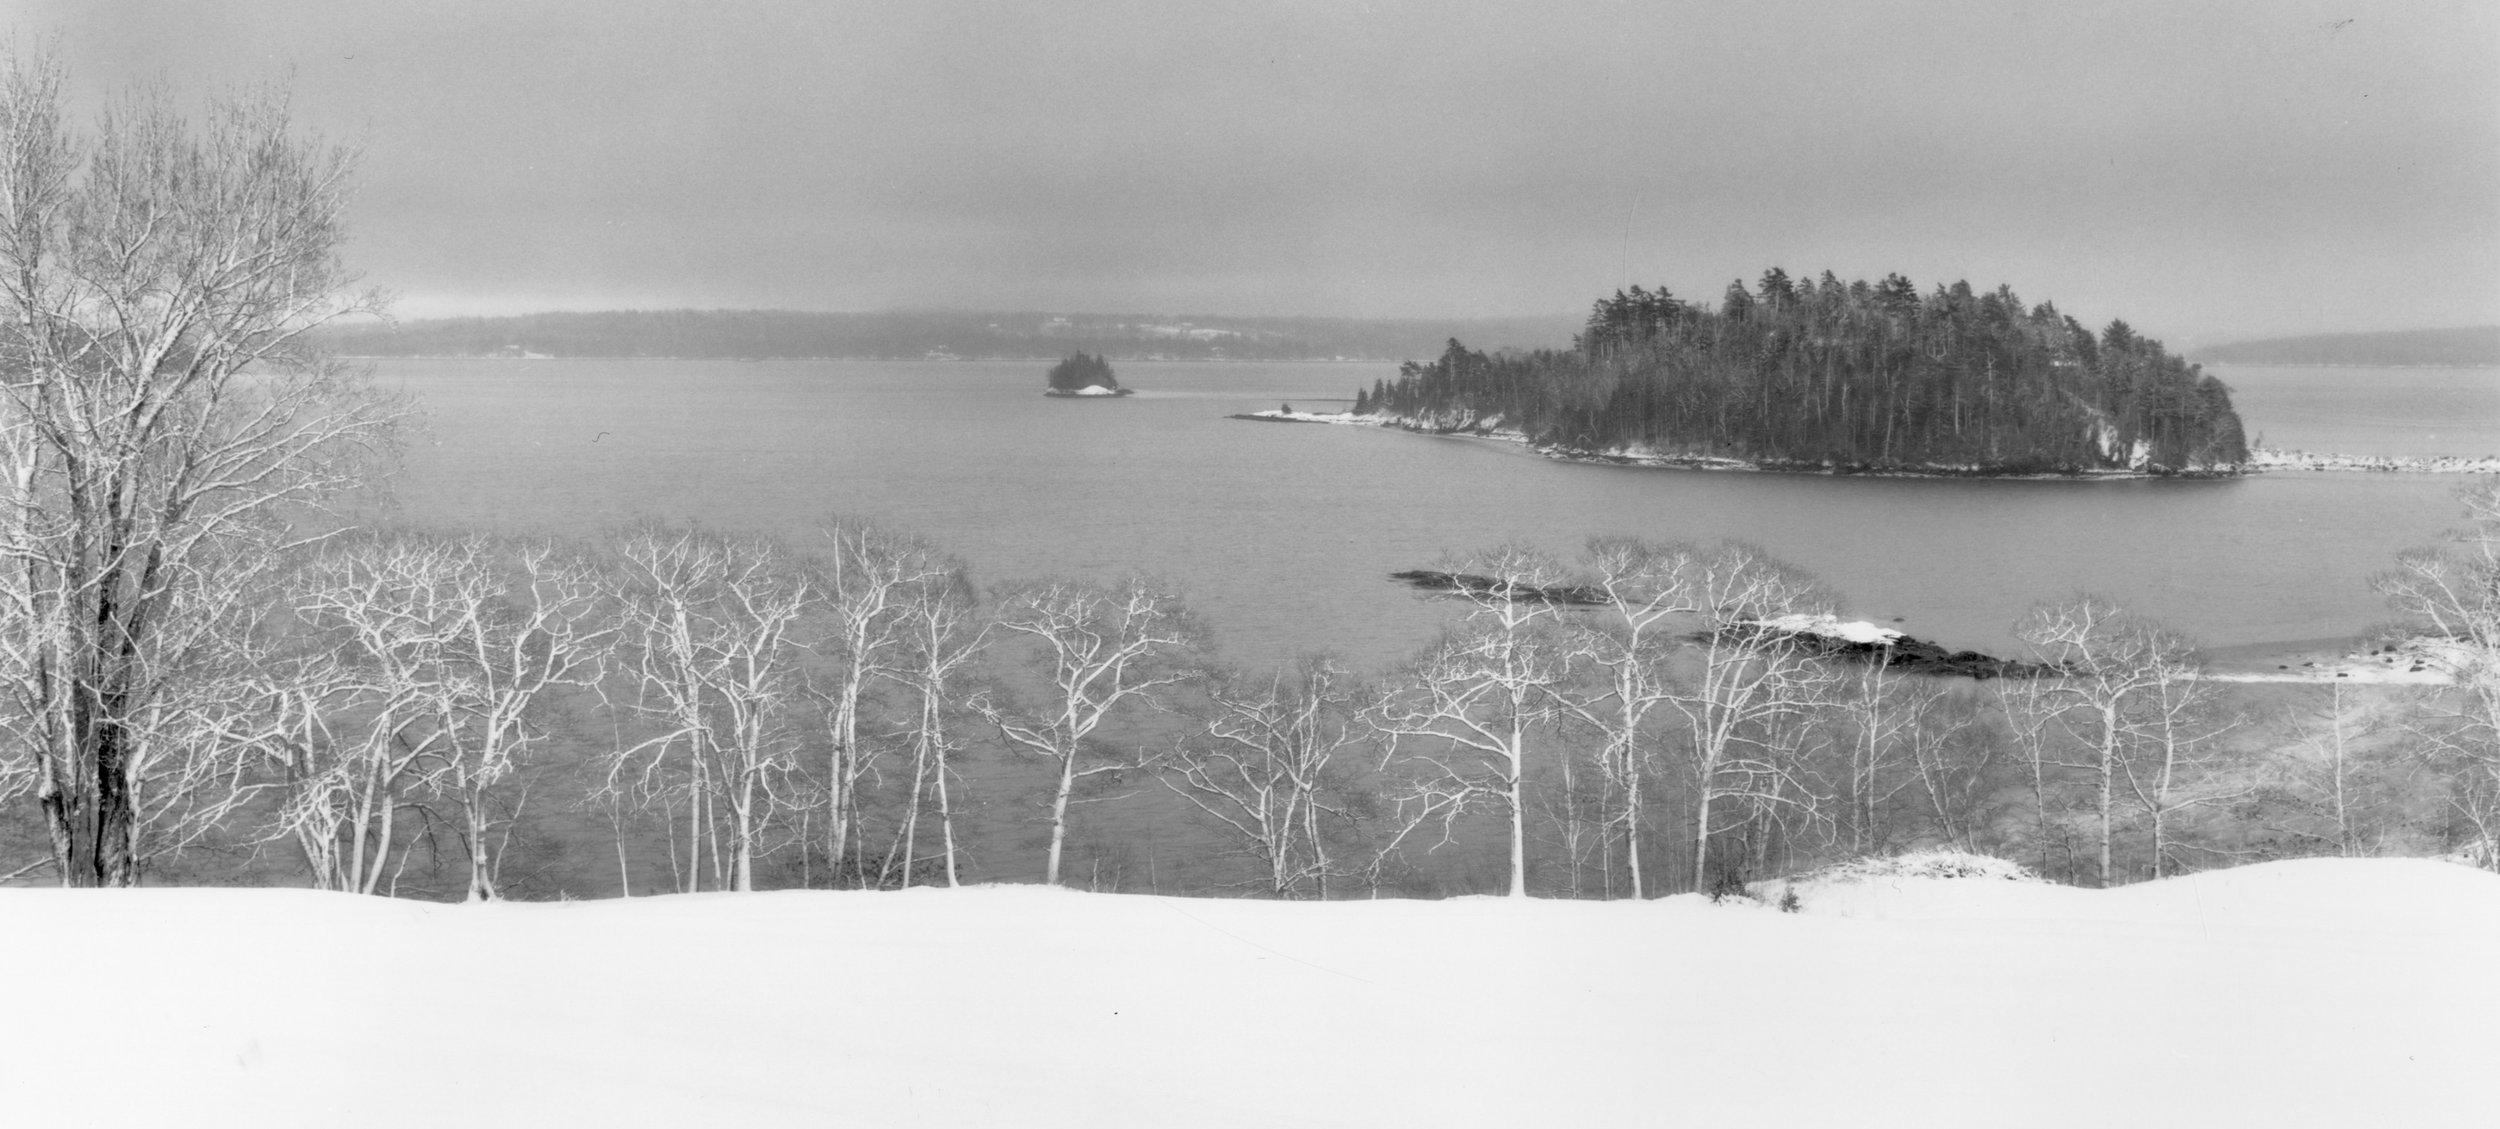 Golf Corse Treasure Island Sorrento Maine